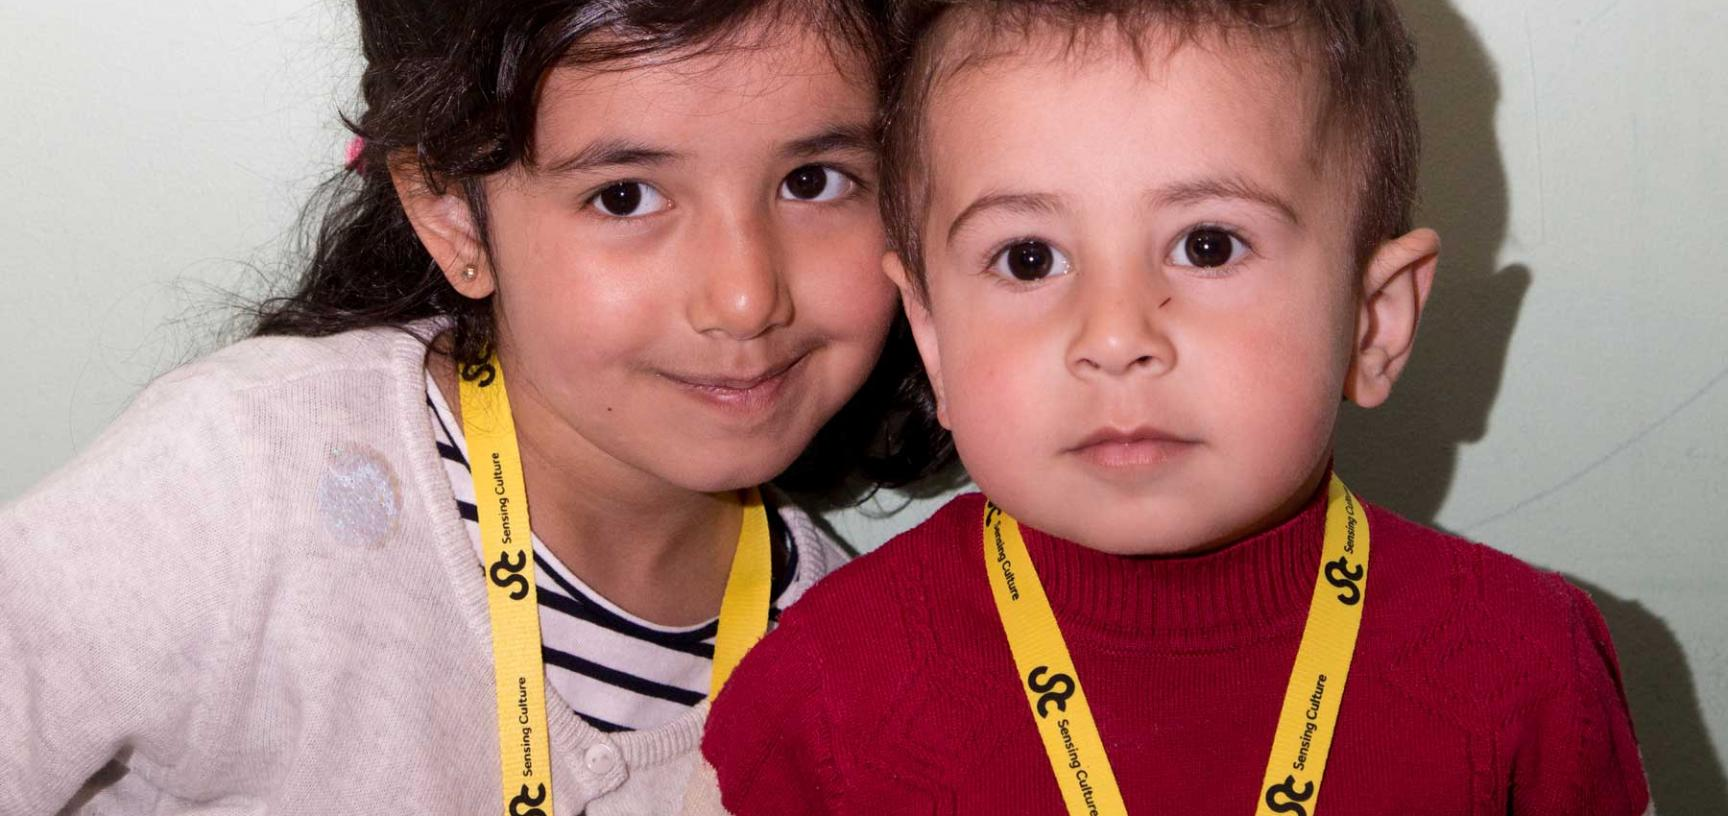 Children at family day